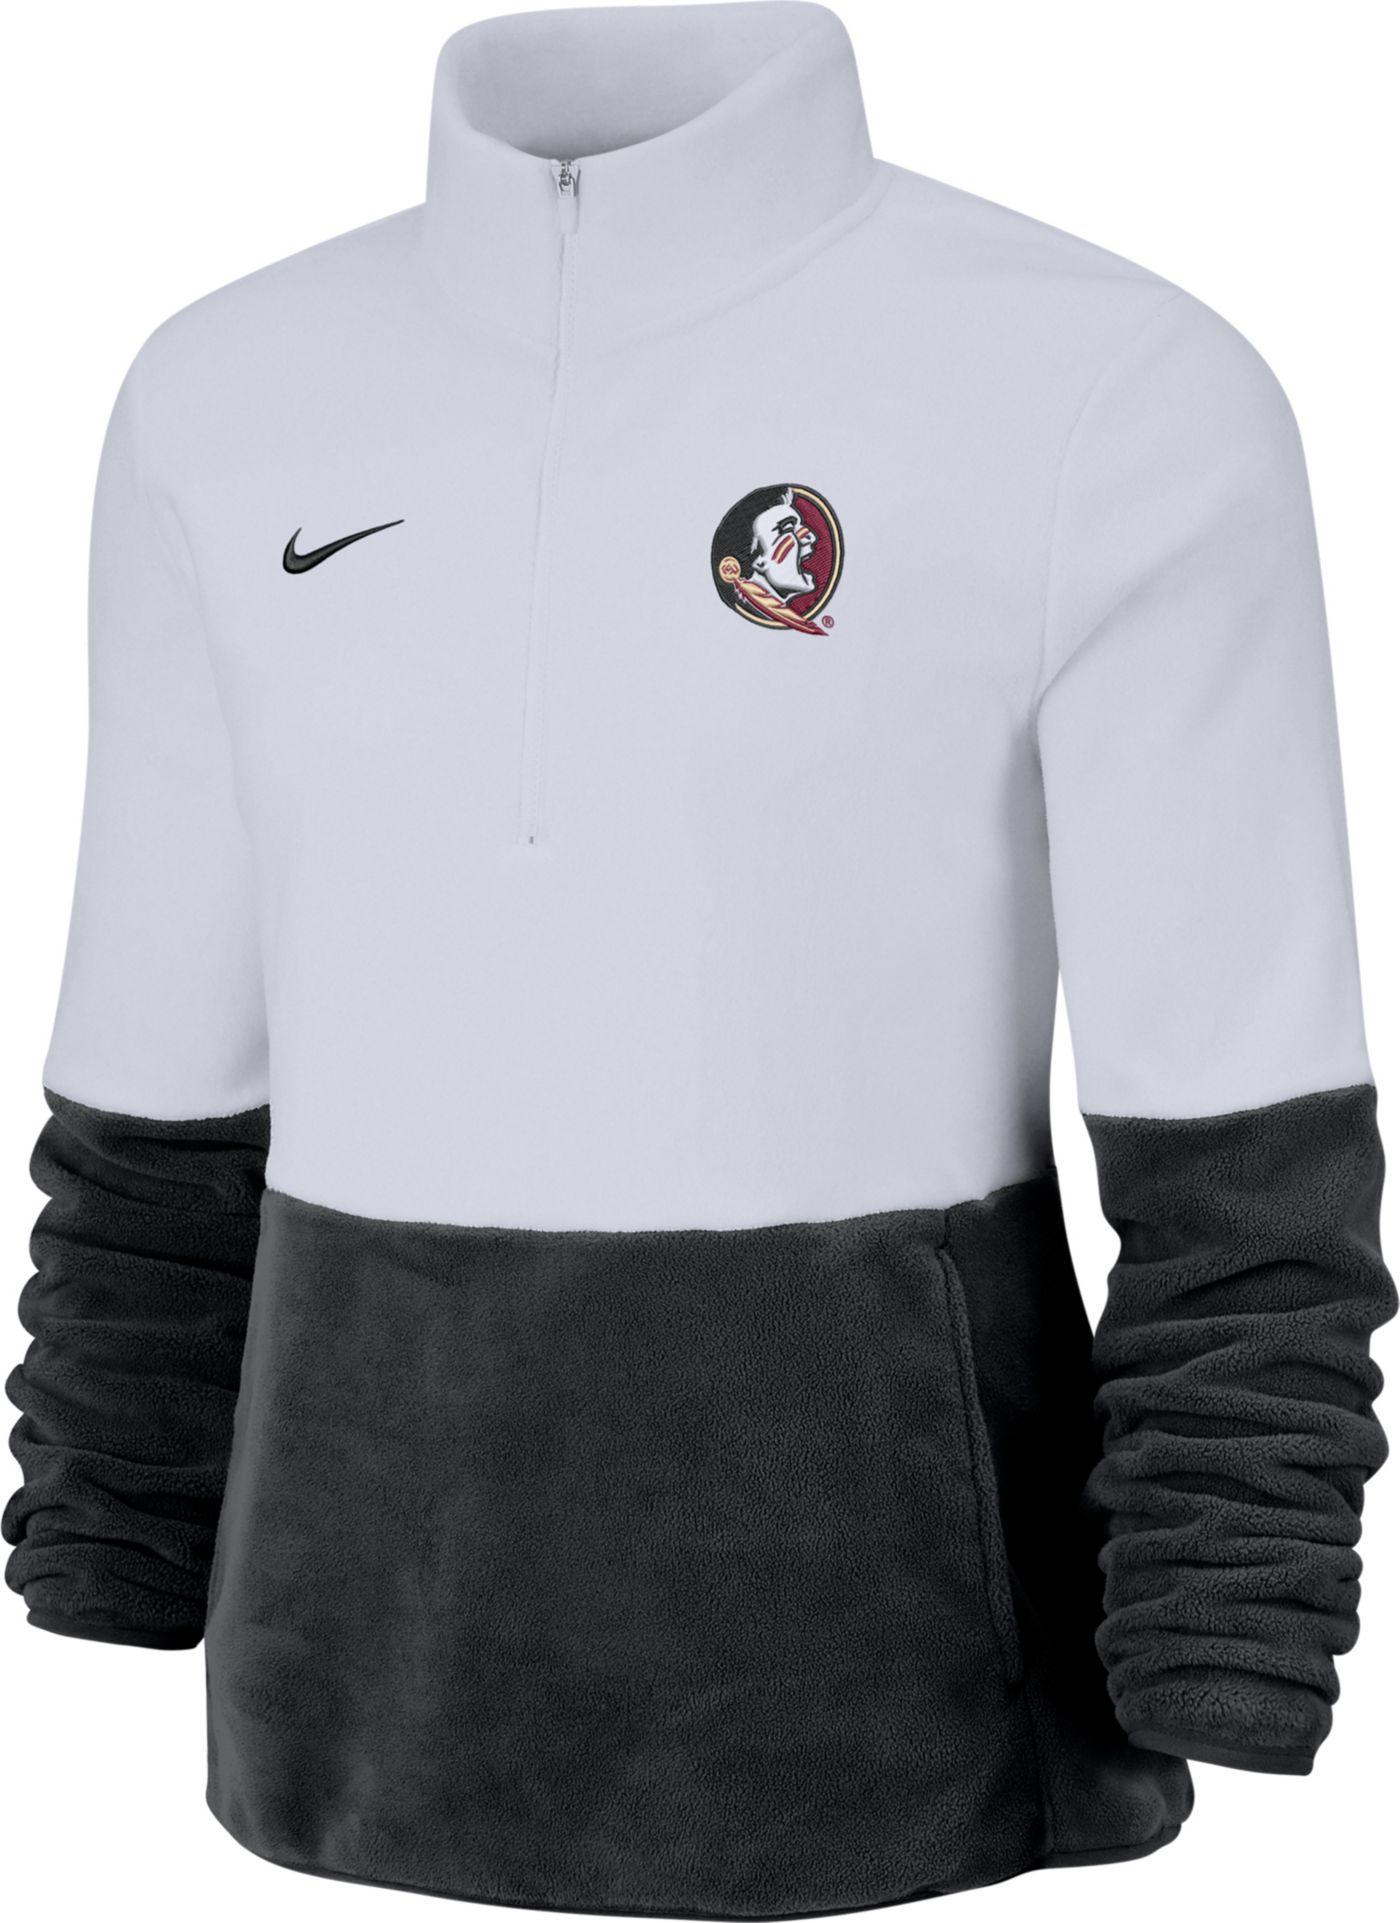 Nike Women's Florida State Seminoles Cozy Therma White Half-Zip Fleece